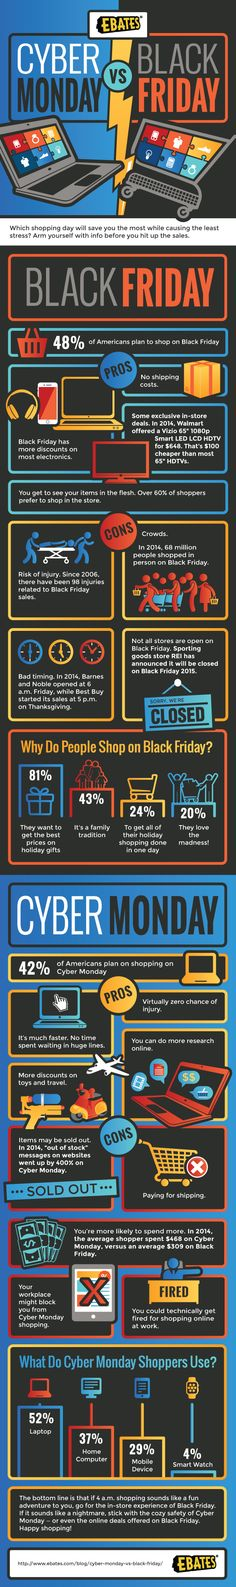 Cyber Monday vs. Black Friday #infographic #BlackFriday #CyberMonday #Business #Marketing